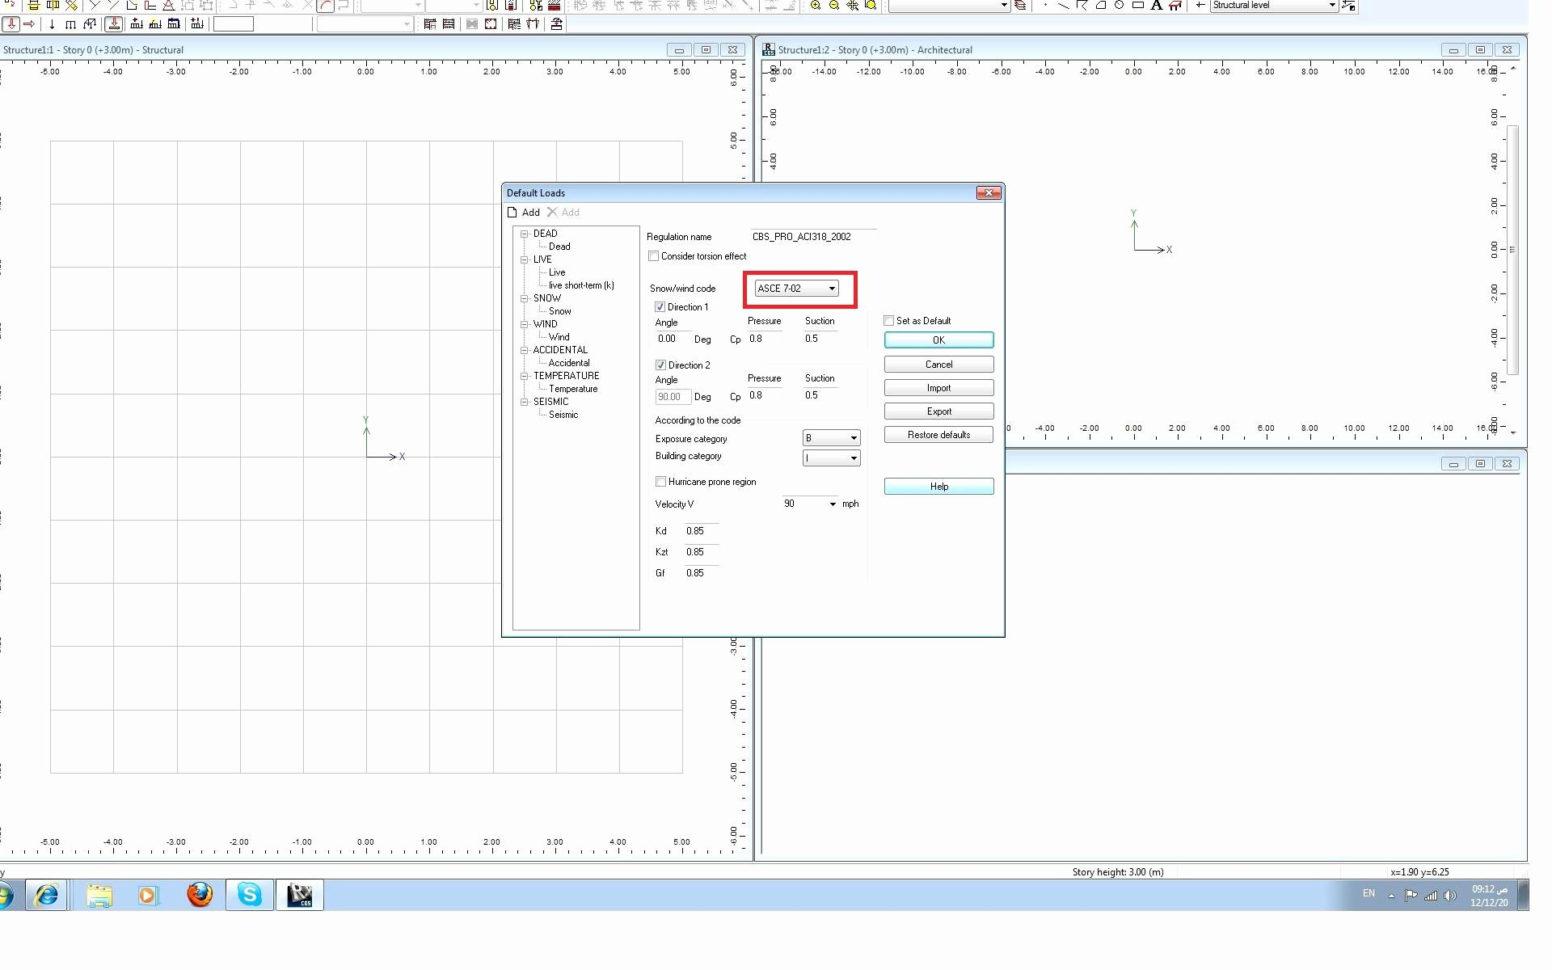 Cd Ladder Calculator Spreadsheet Inside Spreadsheet Fresh Retirement Plan Template Creative Resume Templates